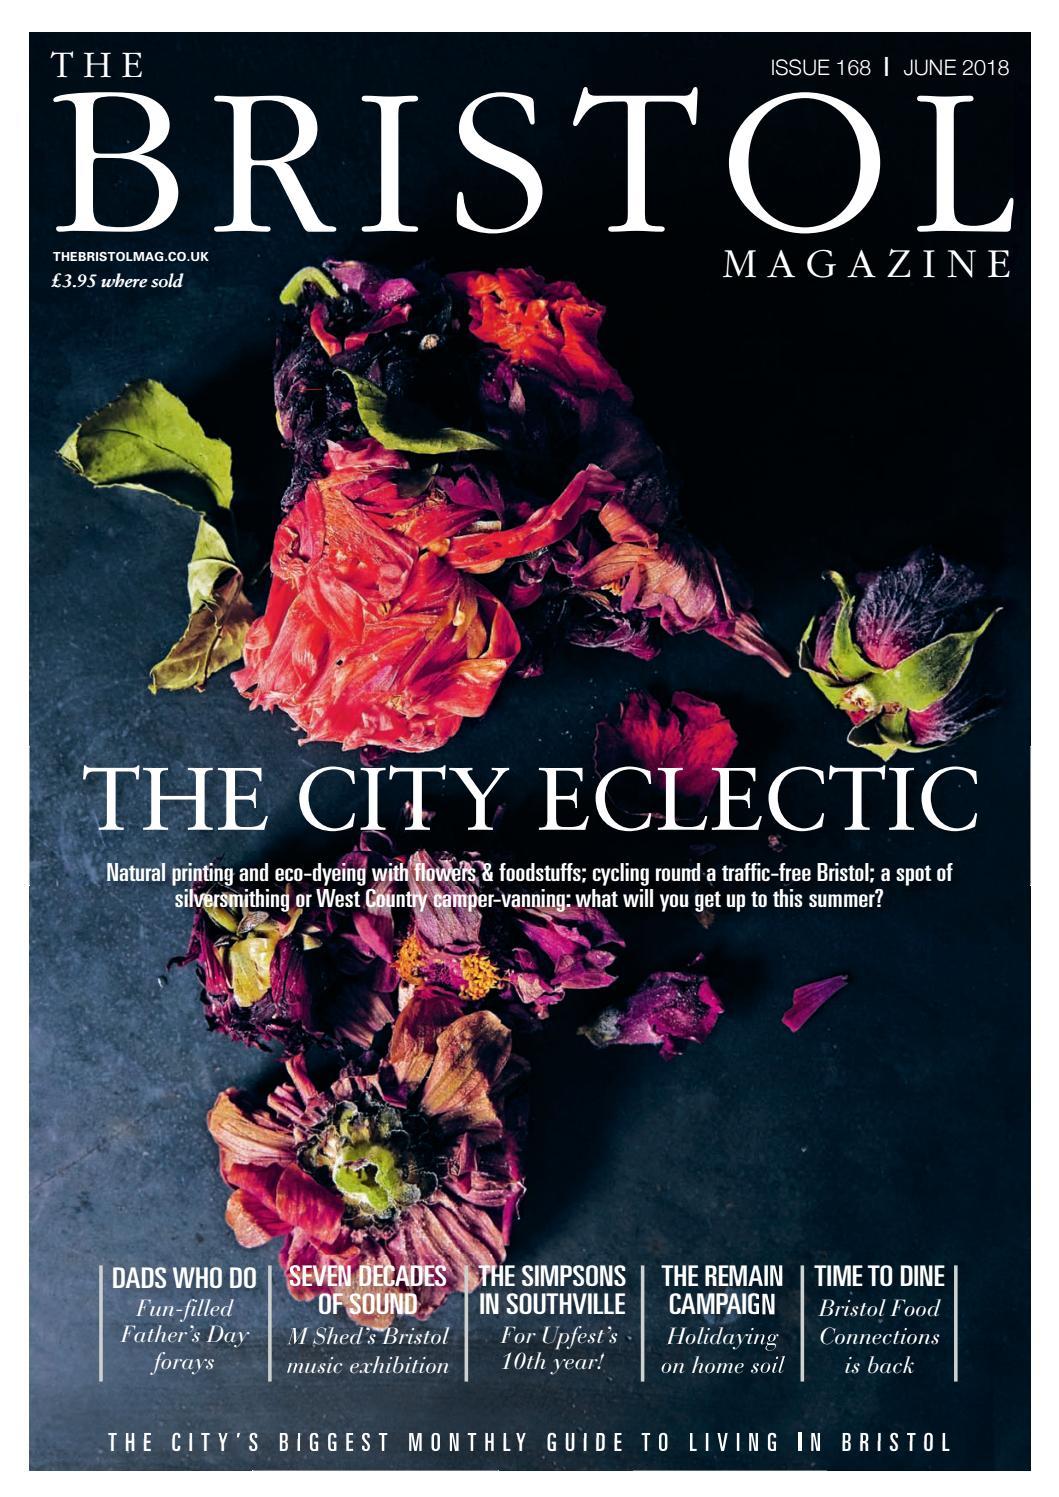 2f267403ab6a The Bristol Magazine June 18 by MC Publishing Limited - issuu